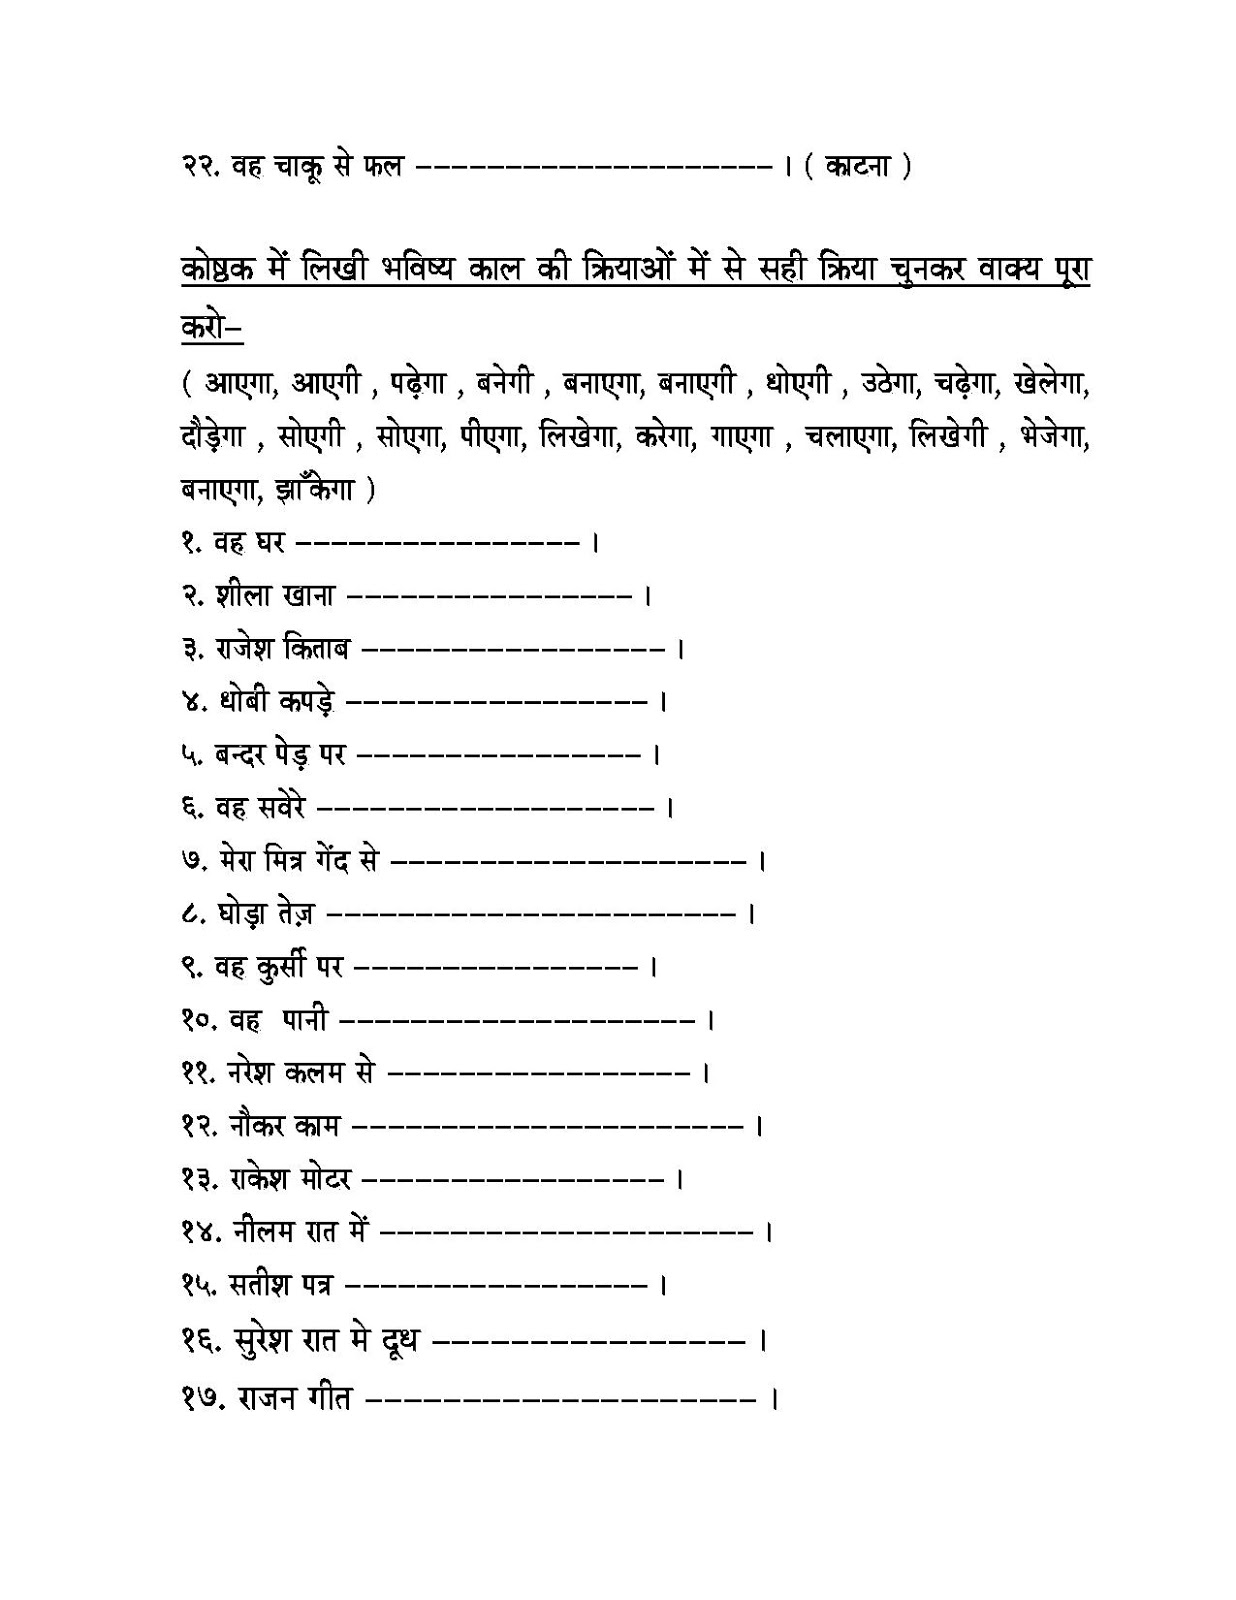 Worksheet Grammar For Grade 3 worksheet grammar for grade 3 mikyu free worksheets hindi 6 worksheets